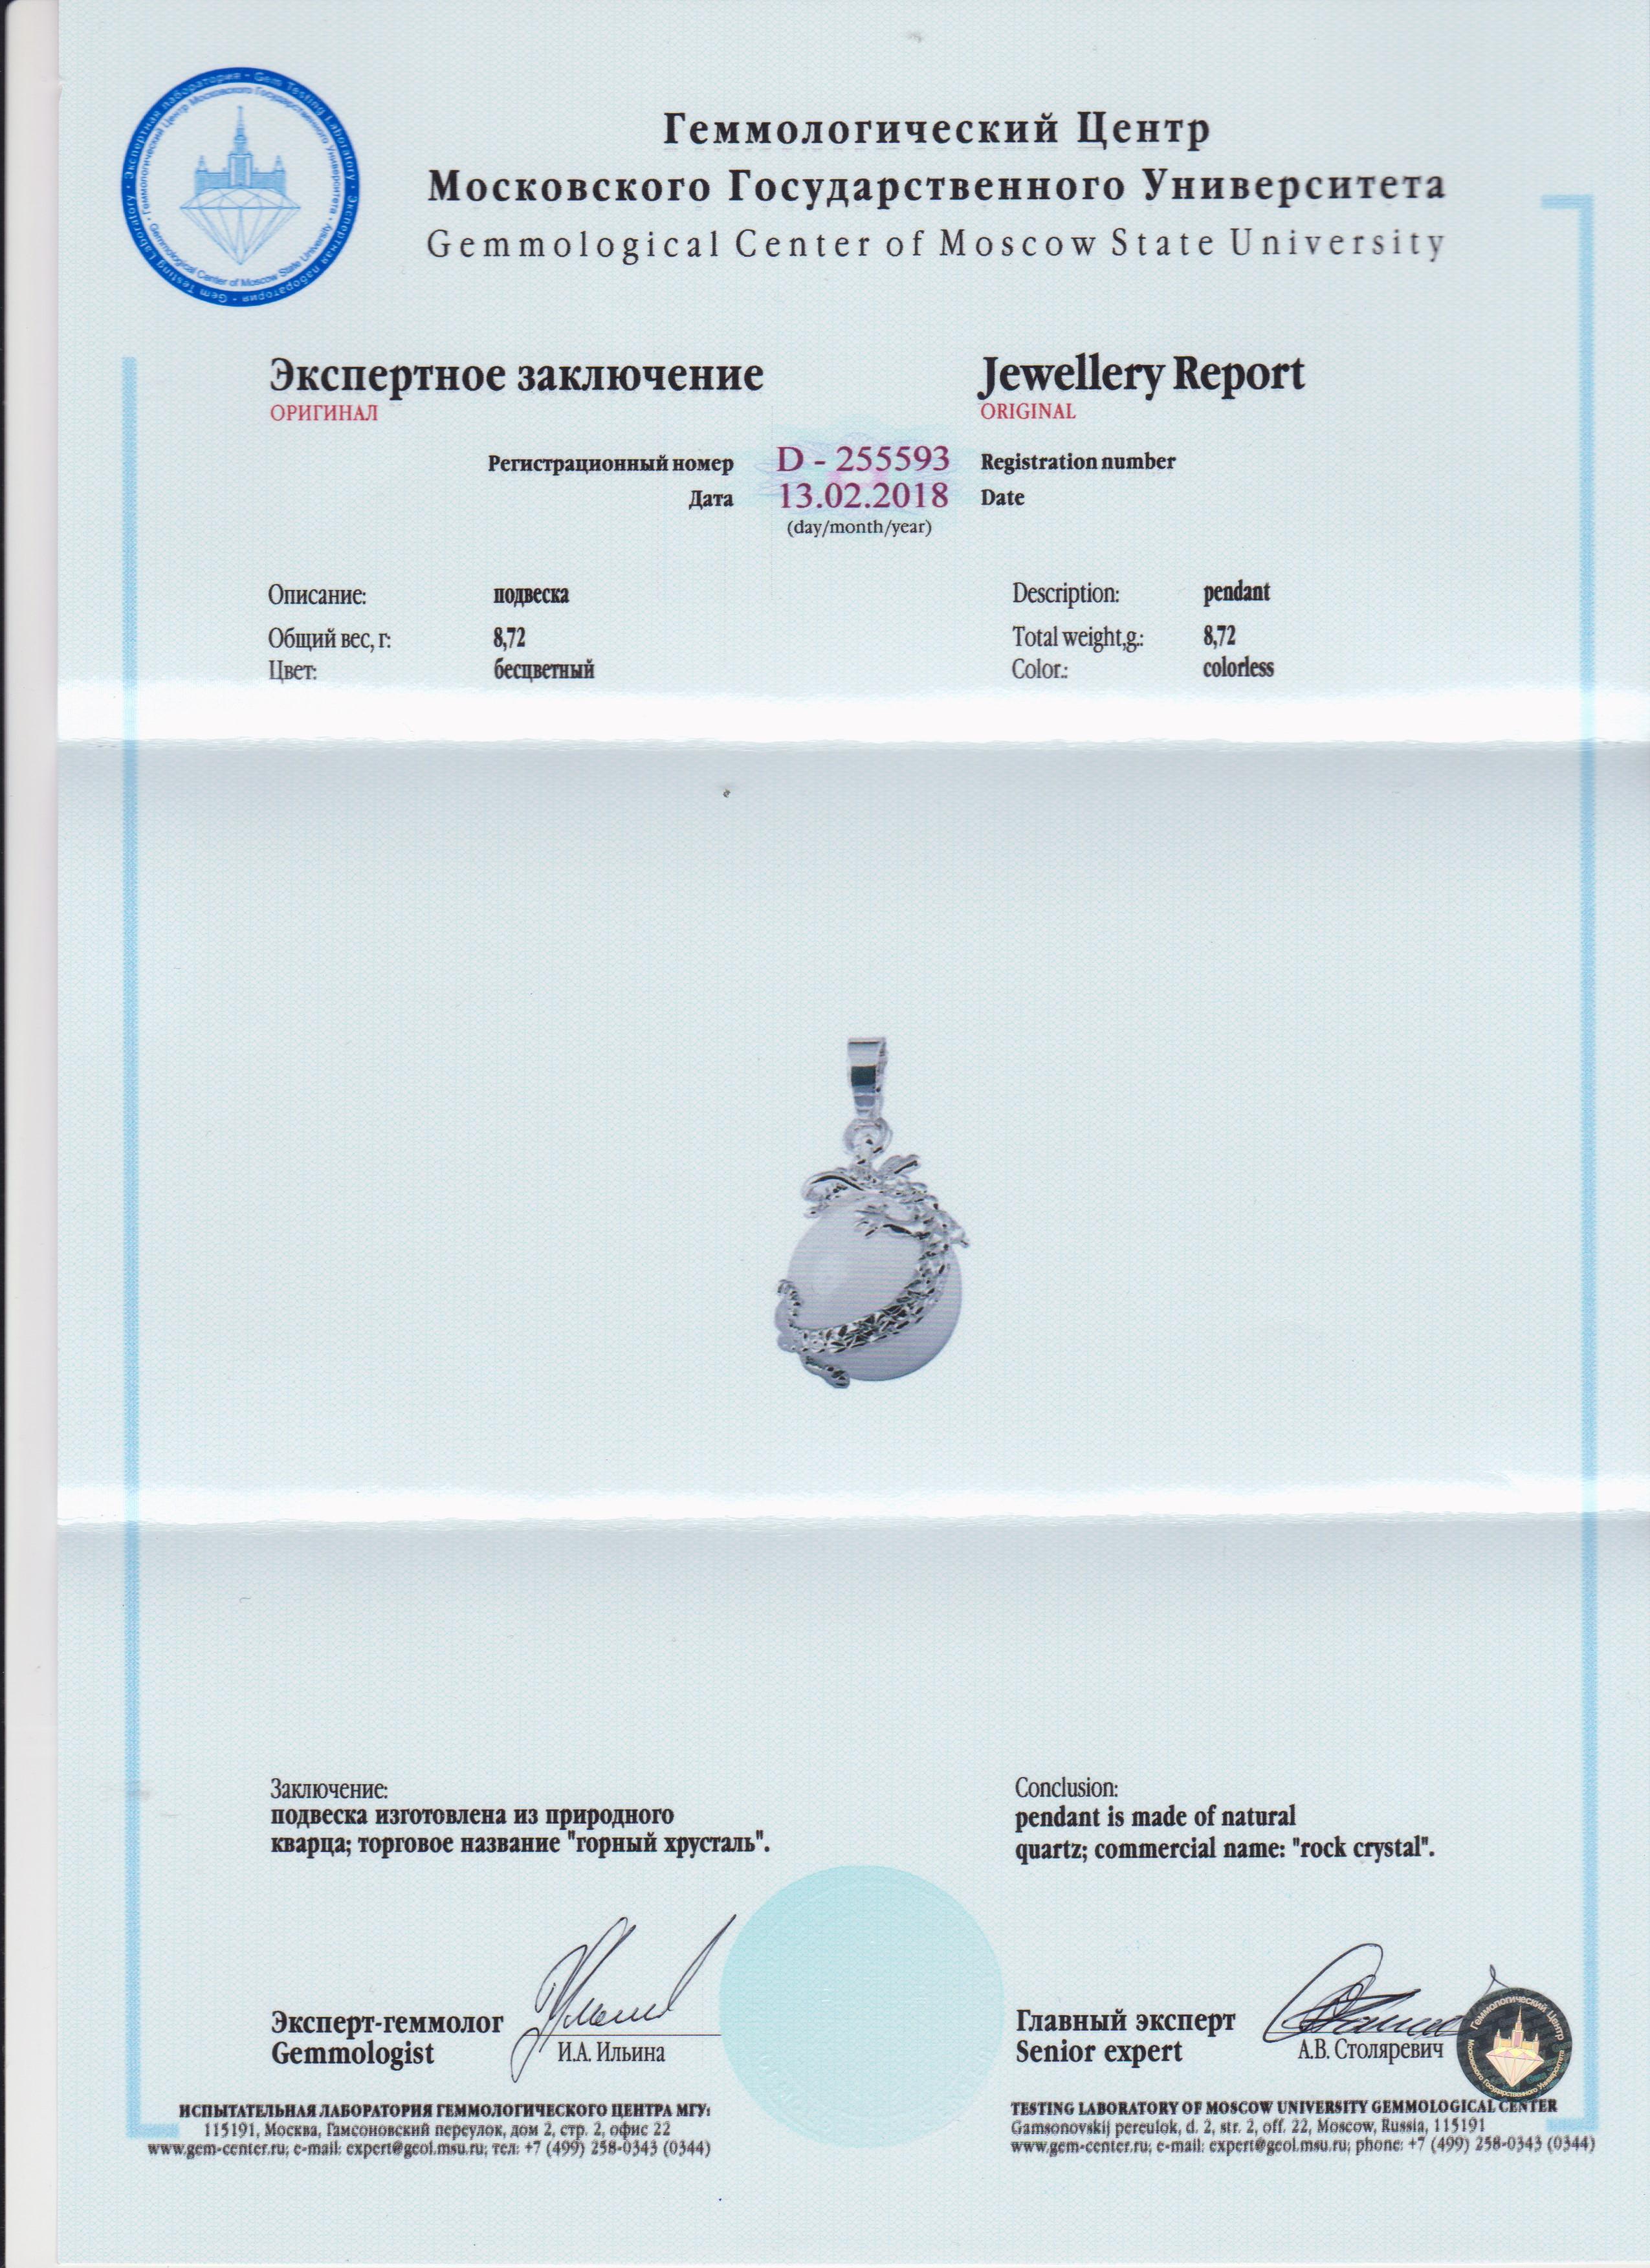 https://mineralmarket.ru/img/certificate/40/1520250270.jpg